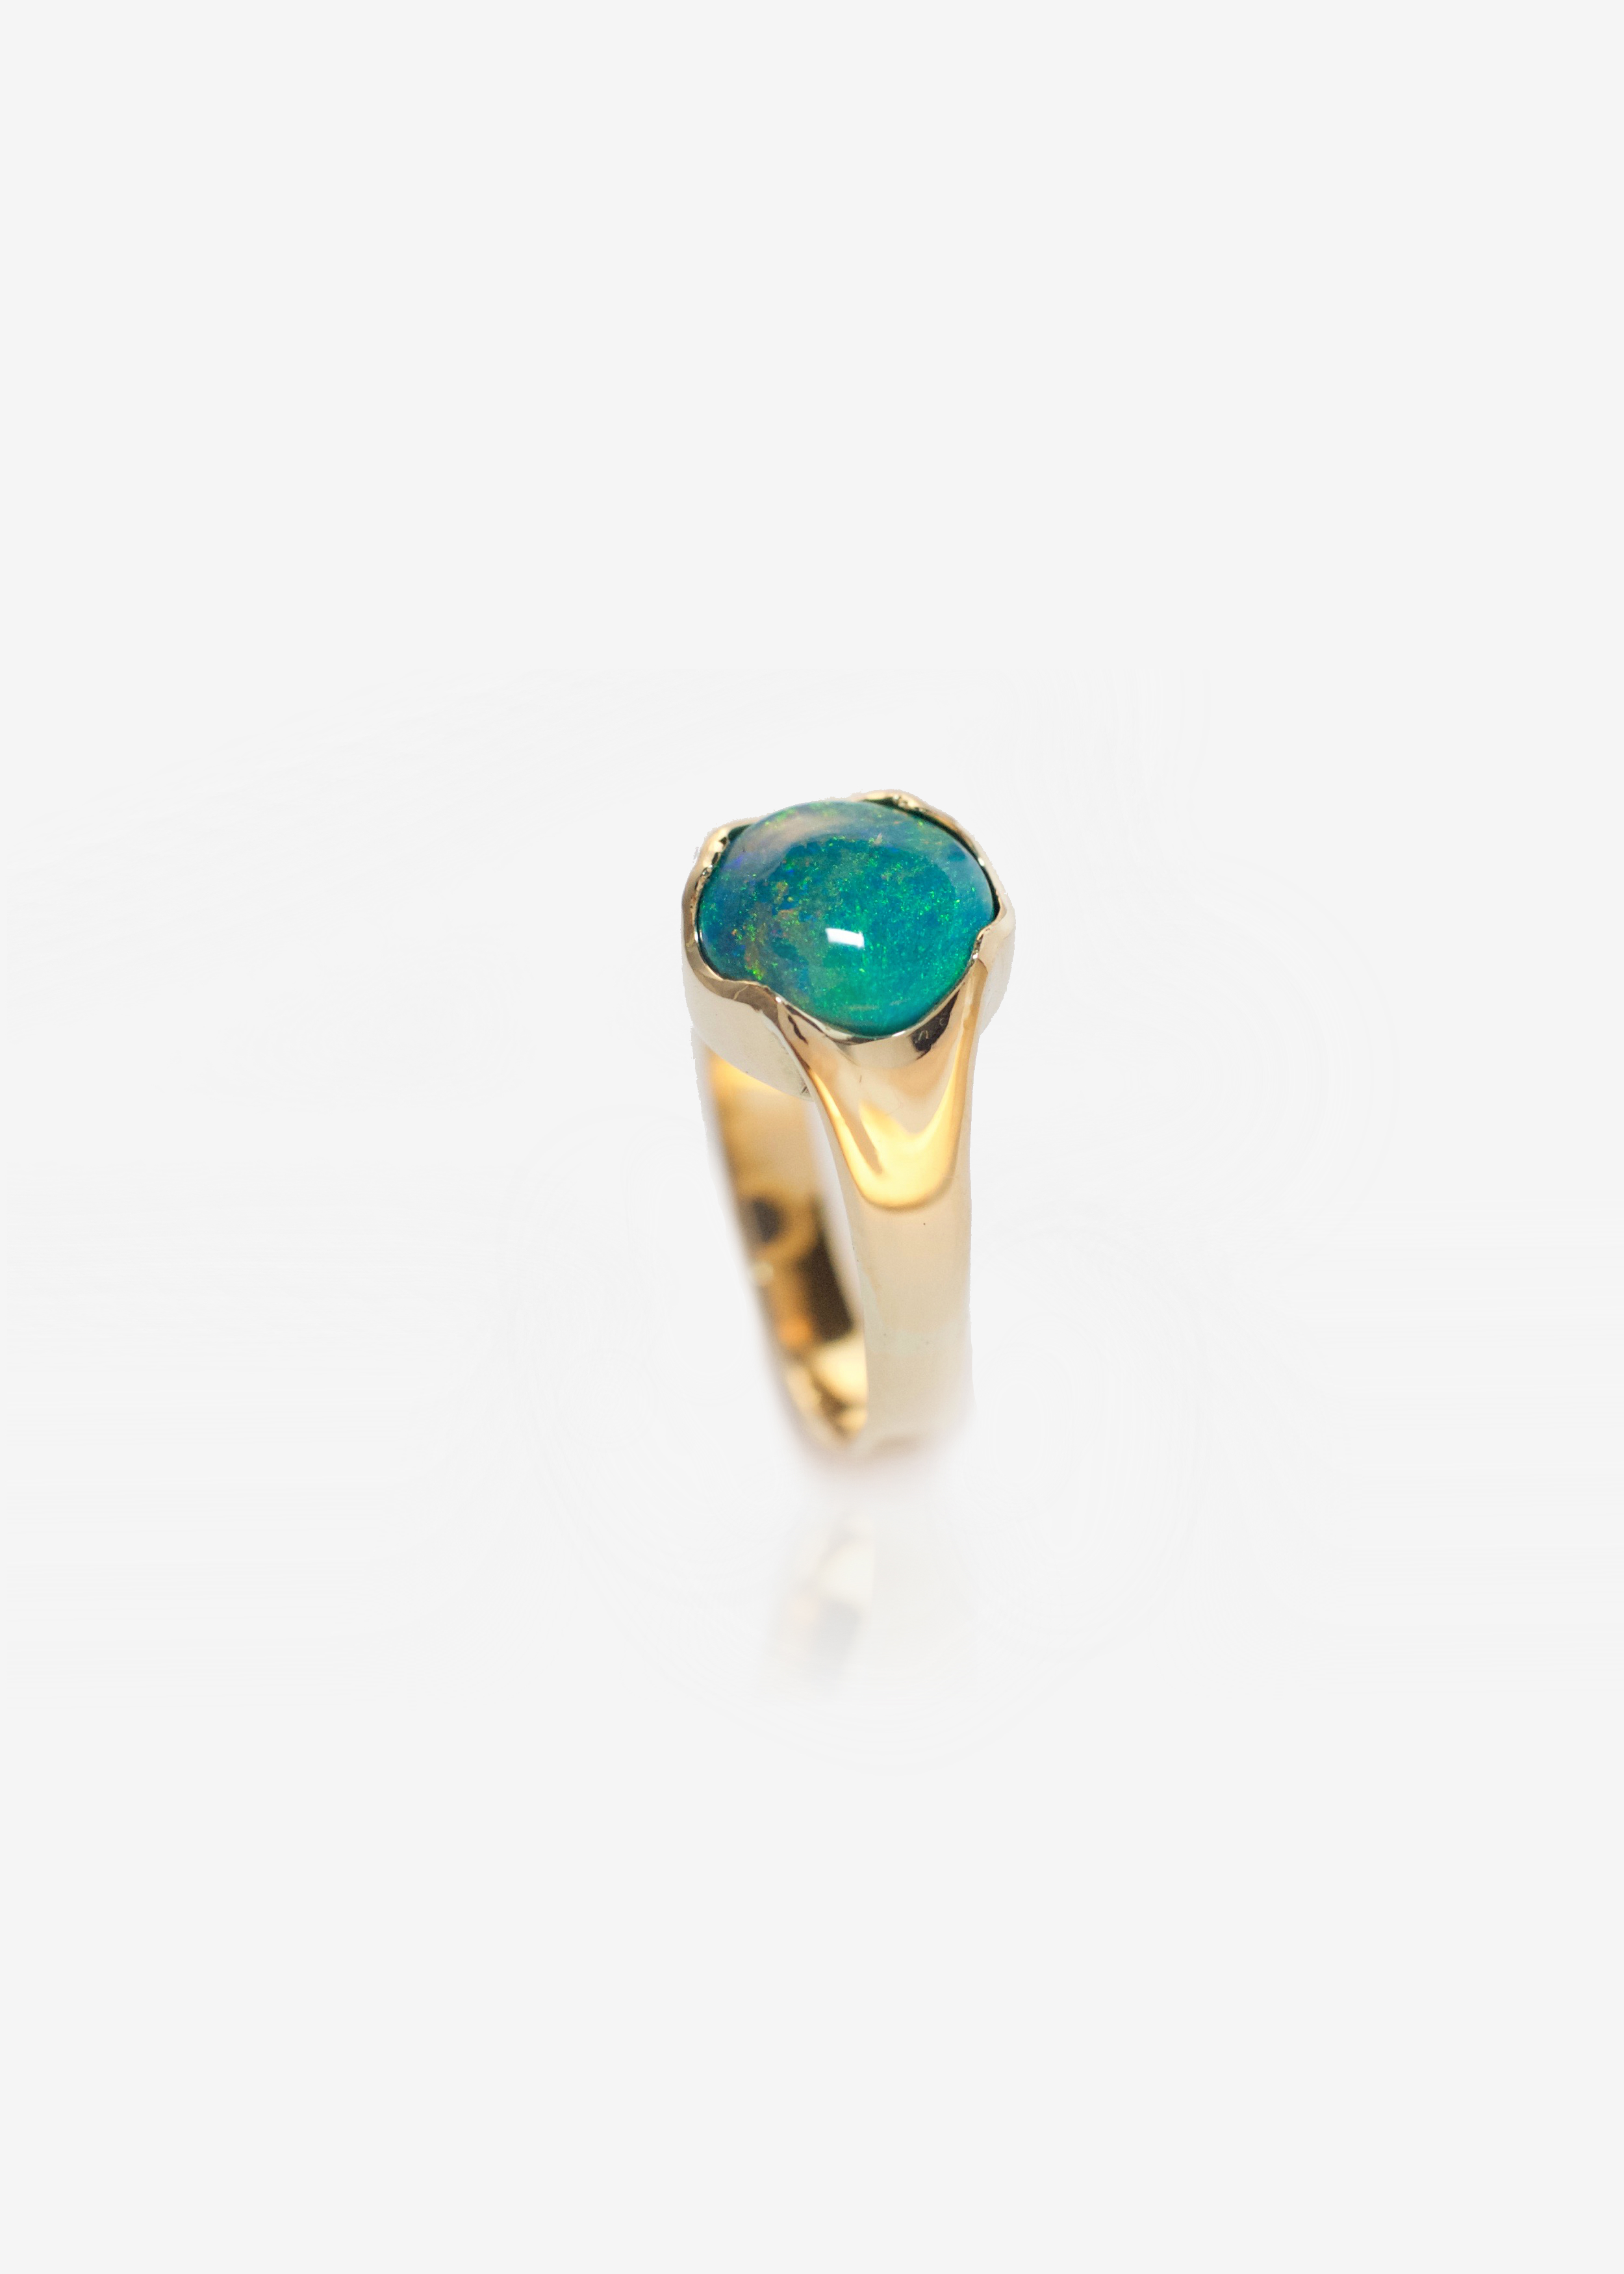 18K yellow gold Ecogold black opal engagement ring